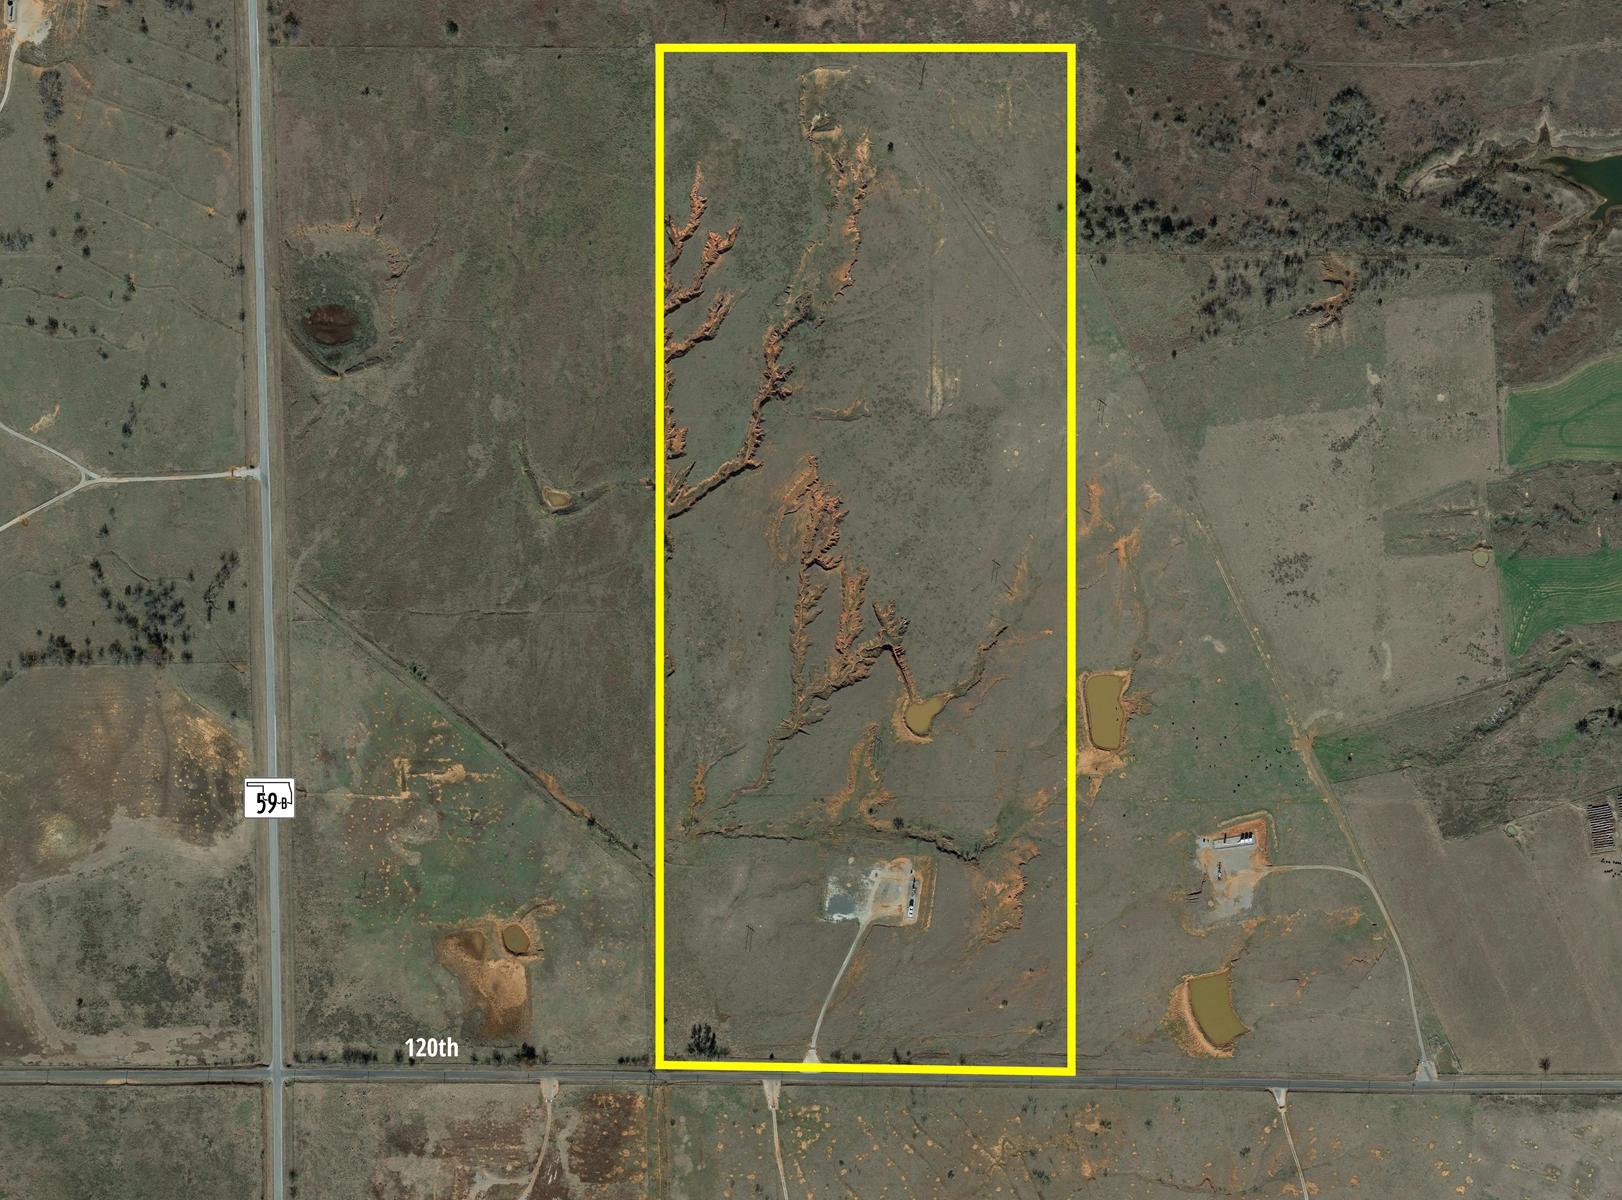 LAND FOR SALE LINDSAY MCCLAIN COUNTY OKLAHOMA PROPERTIES